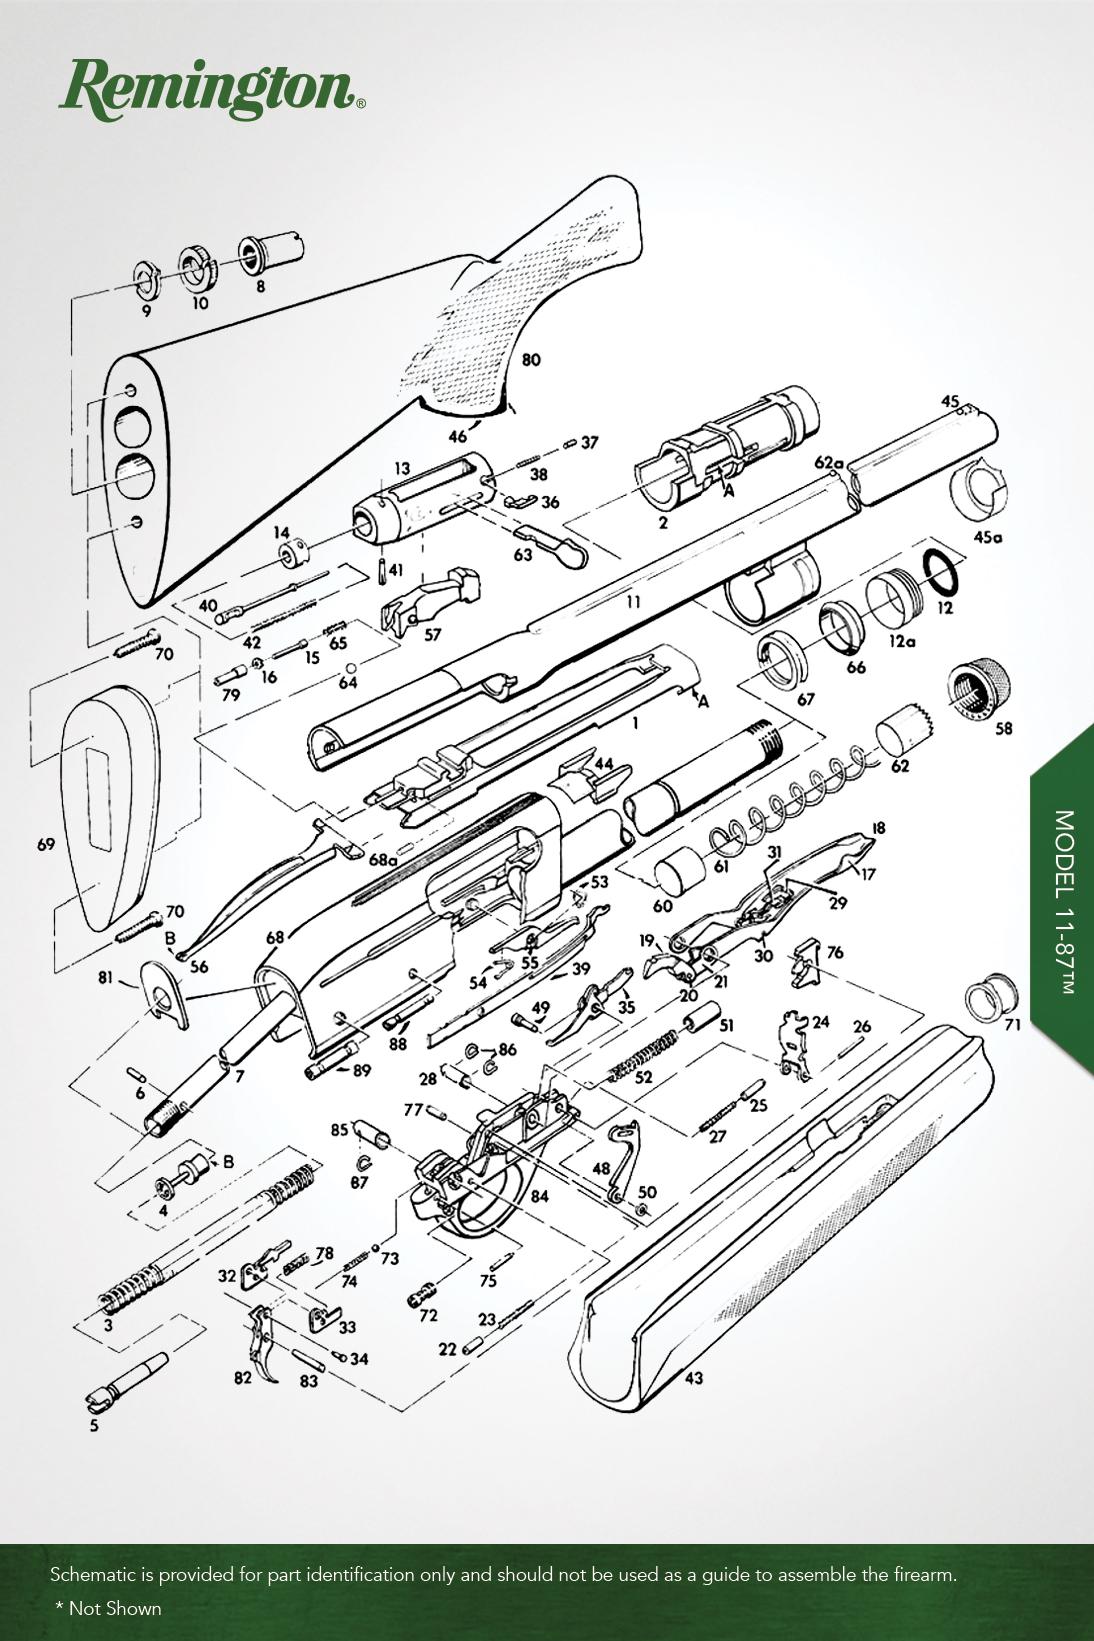 Model 11-87™ / 11-87 SM™